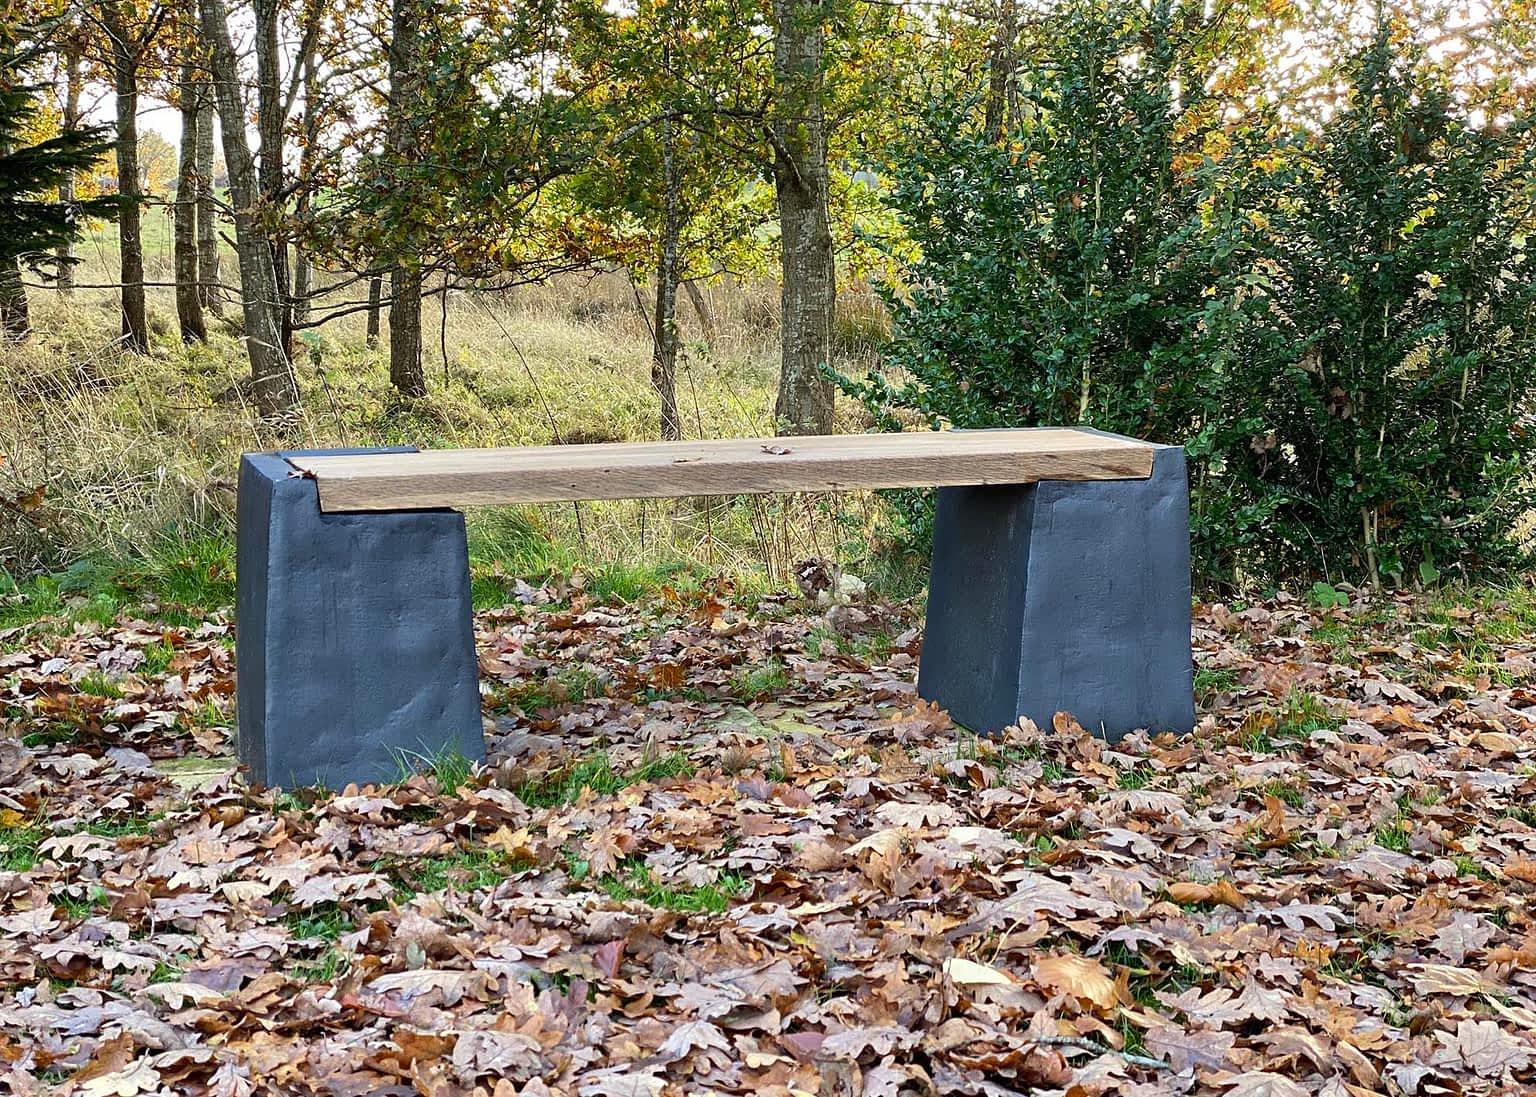 Clay-bench-sculpture-engholm-michelsen-lav-stentoejs-baenk-2